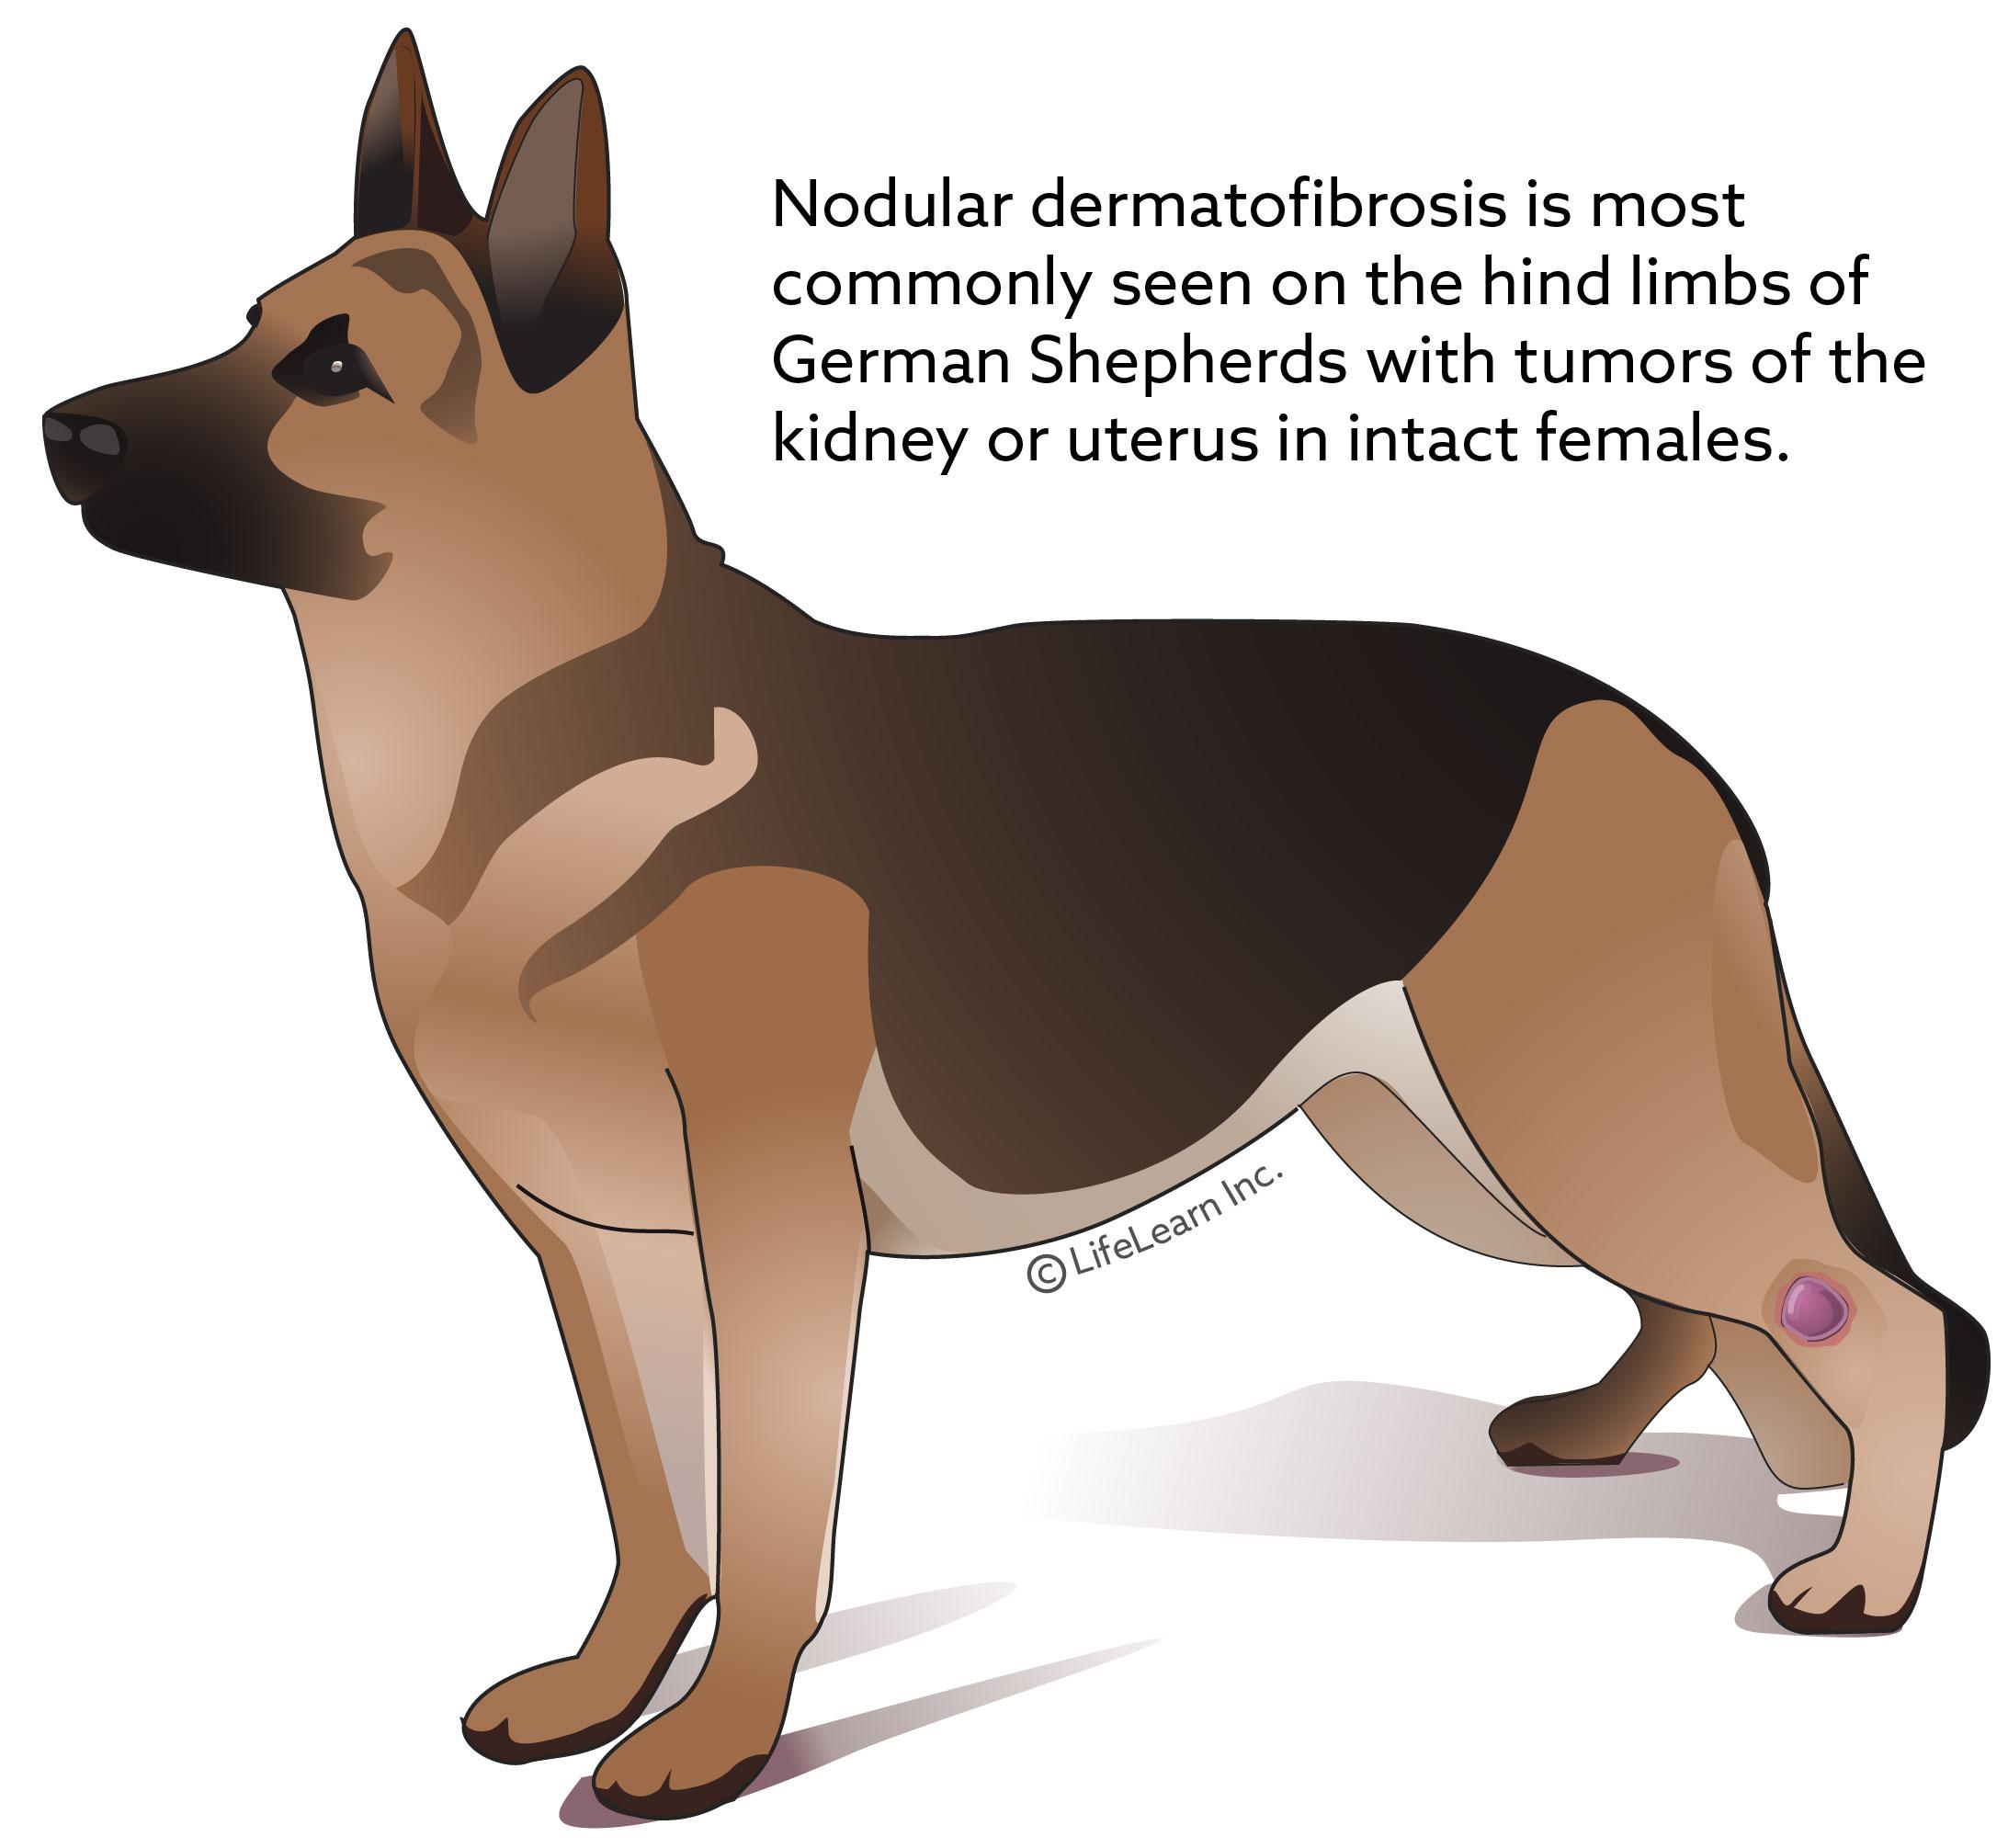 dog_nodular_dermatofibrosis_2018-01